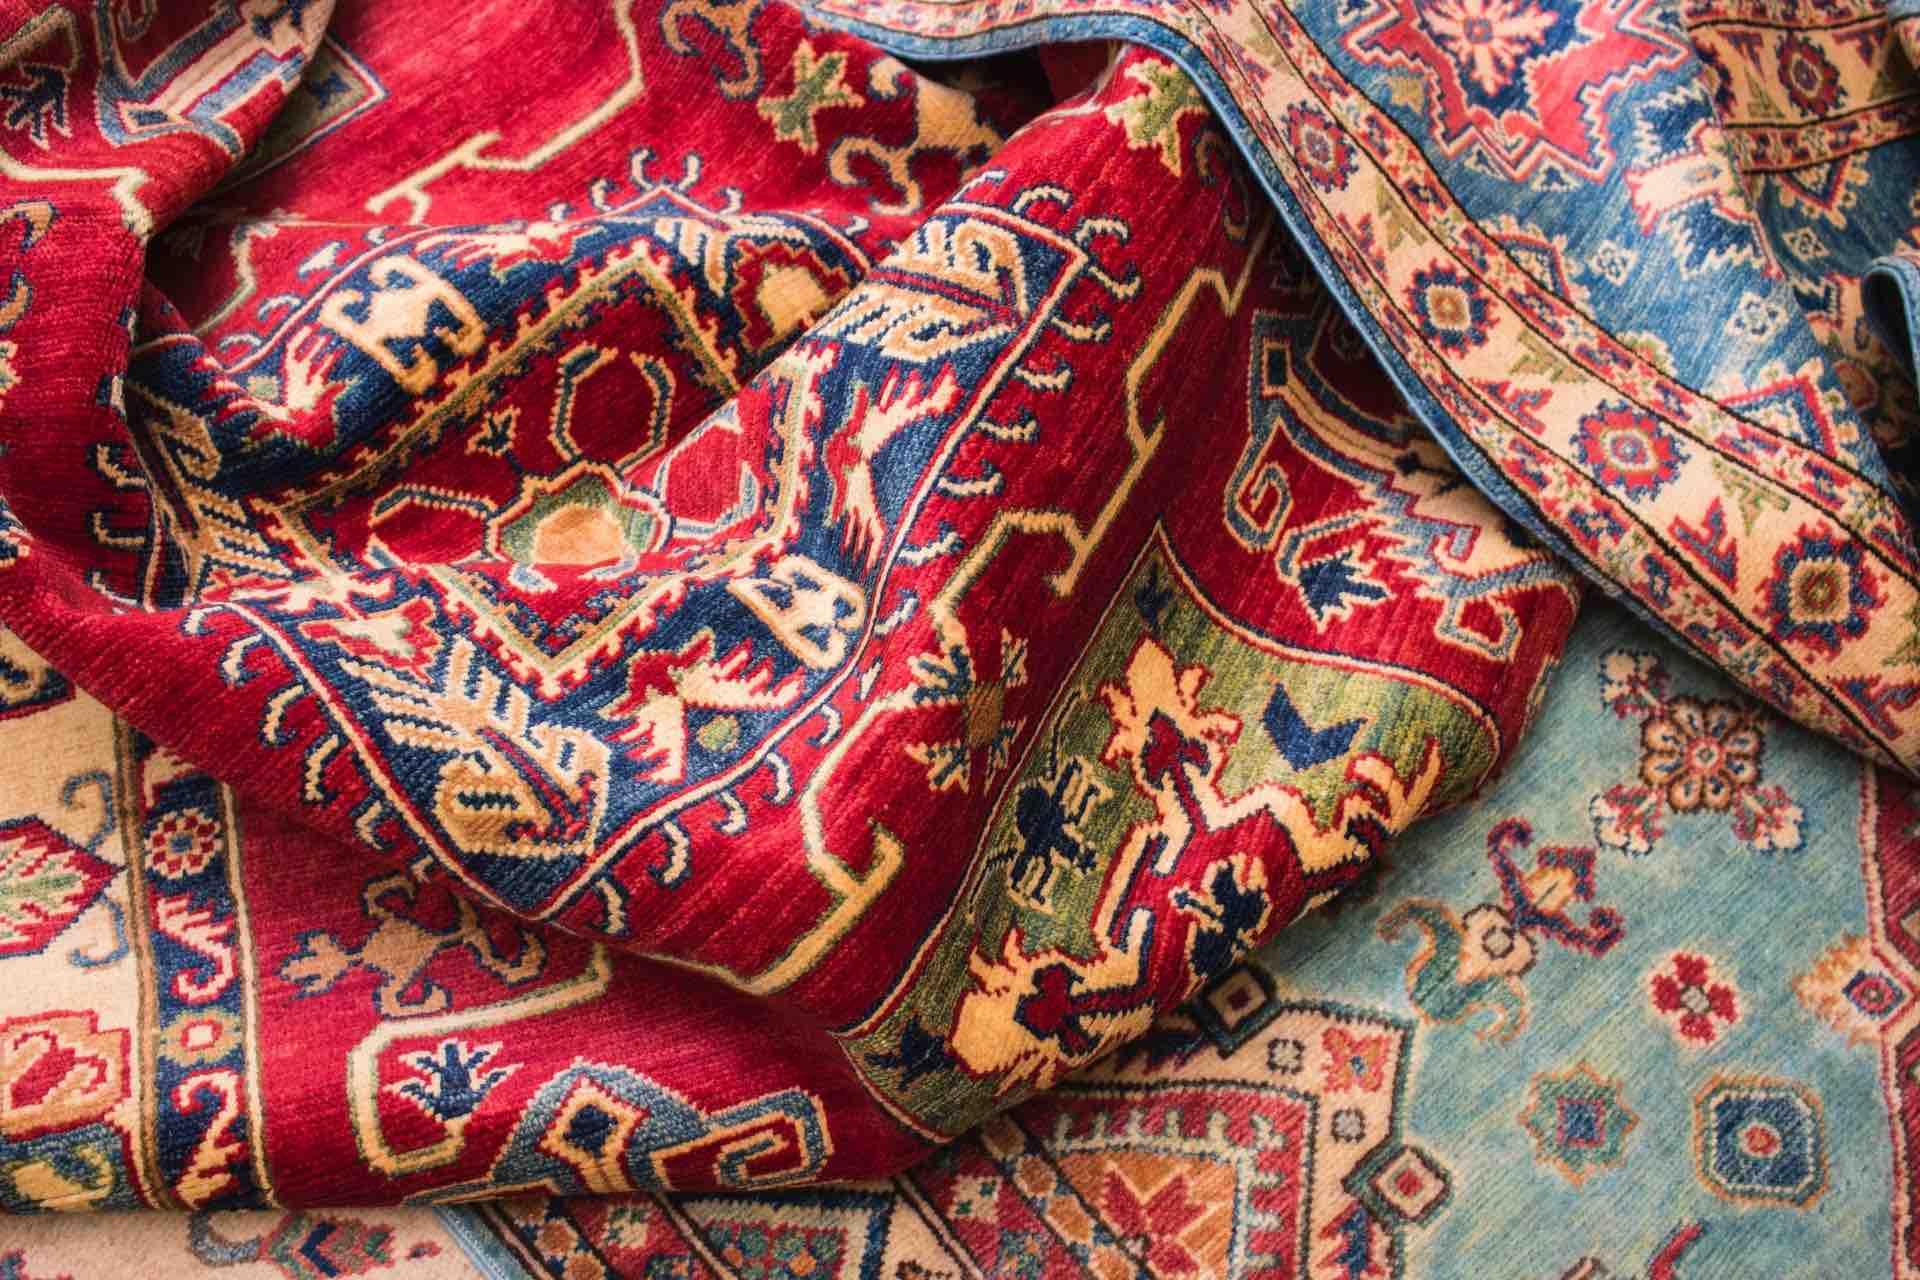 tapis marocain textile motif